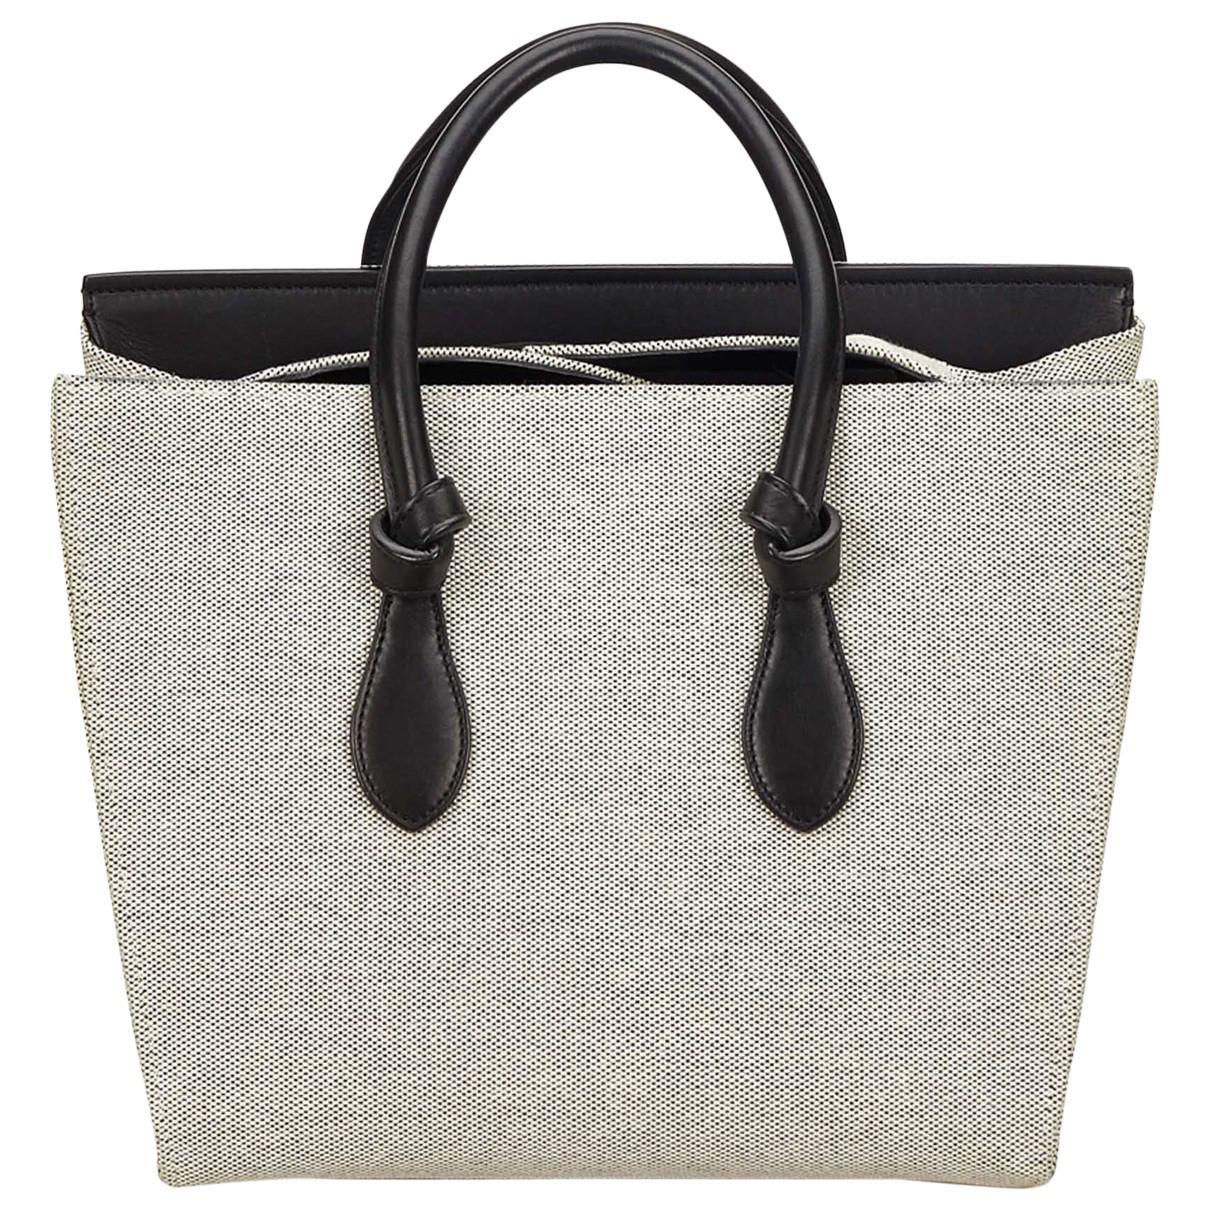 Céline Tie Cloth Handbag in Gray - Lyst d064d318a963b